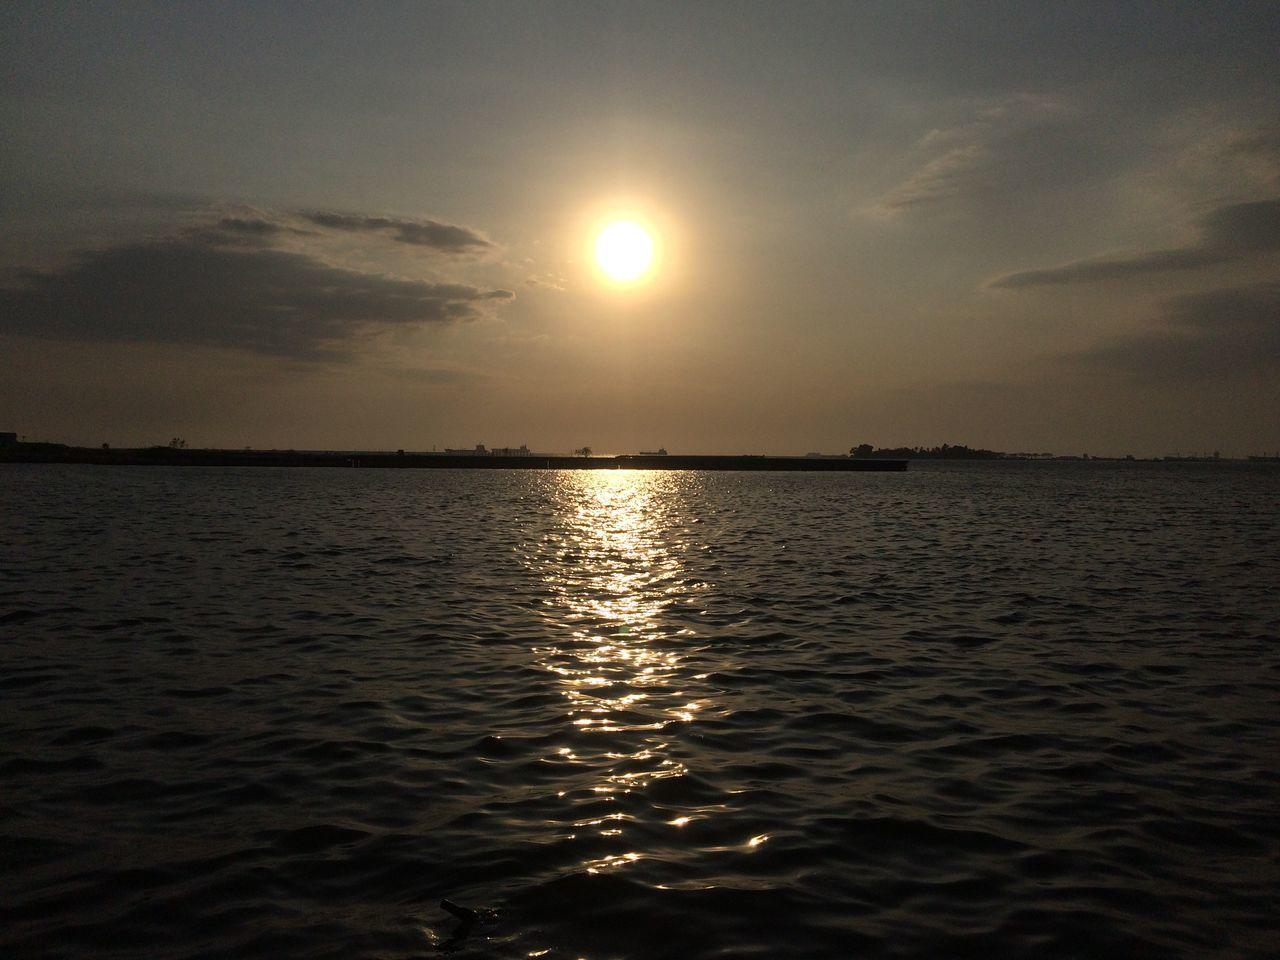 Beach Beautiful Sunset Beauty In Nature Calm Losari Beach Outdoors Sea Sun Sunset Tourism Water Waterfront